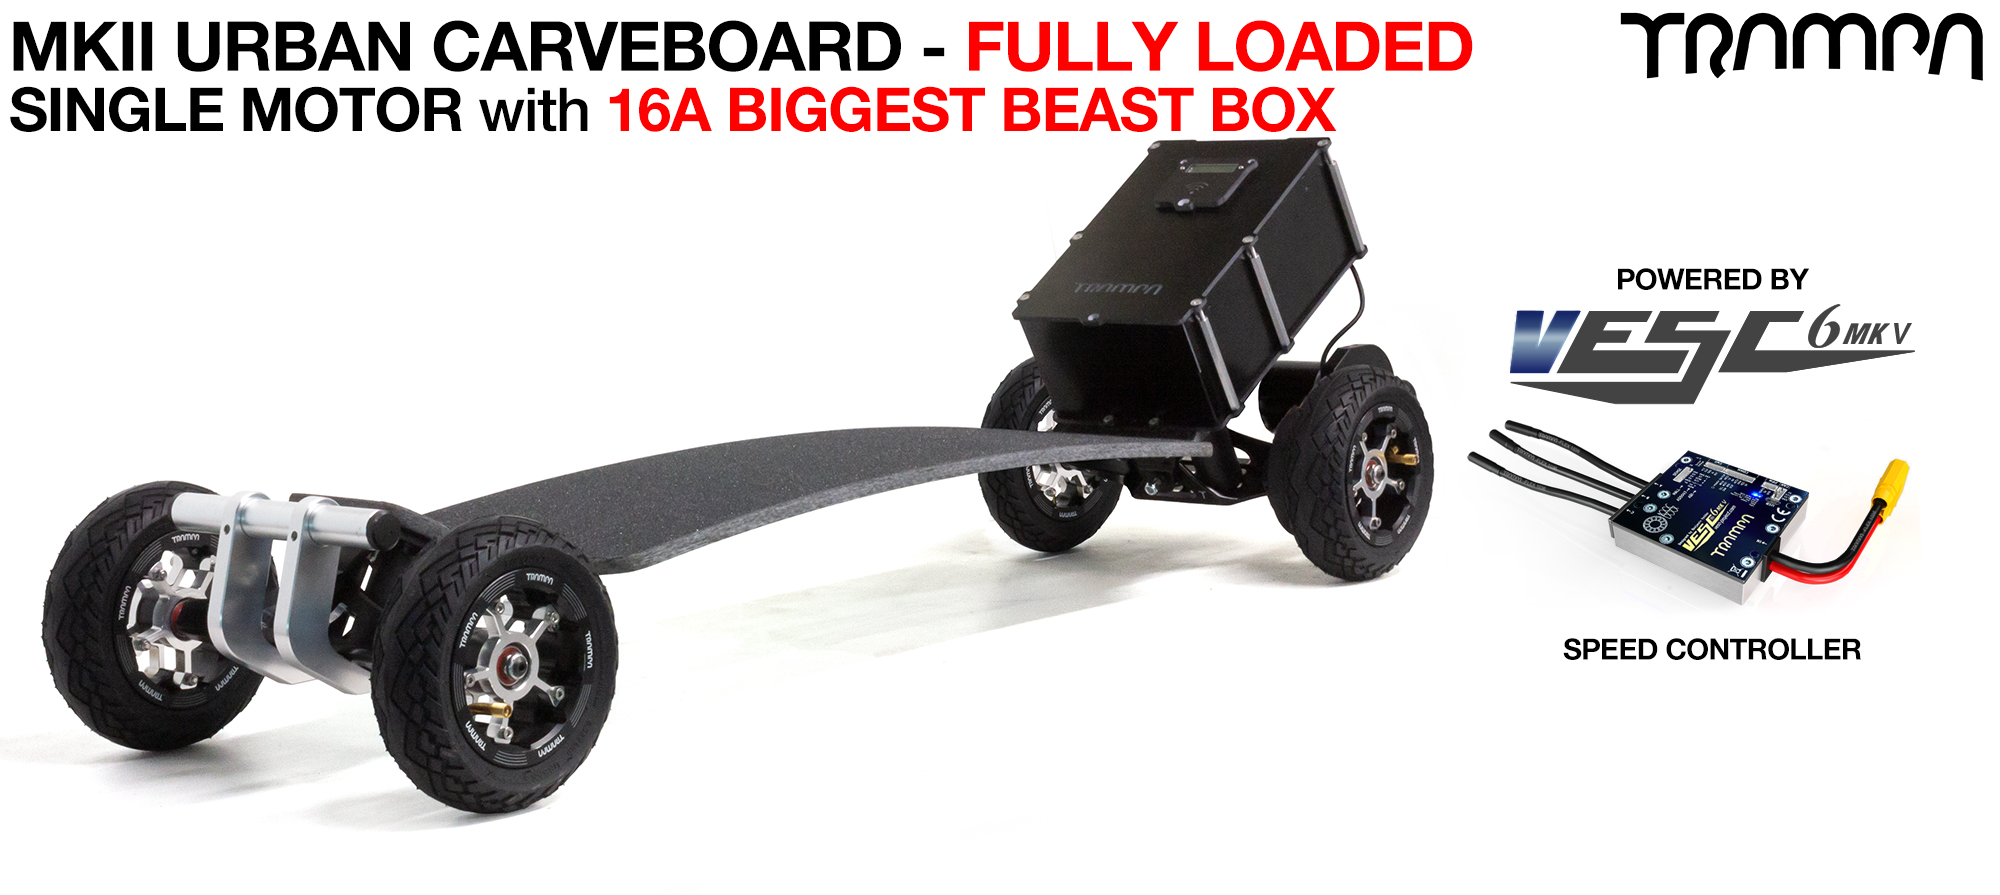 TRAMPA's MkII Electric URBAN Carveboard - uses Mini Spring Trucks with MkII Carve board Motor Mount,s Custom TRAMPA hubs & 125mm URBAN longboard Tyres - SINGLE Motor 16A FULLY LOADED MEGASTAR